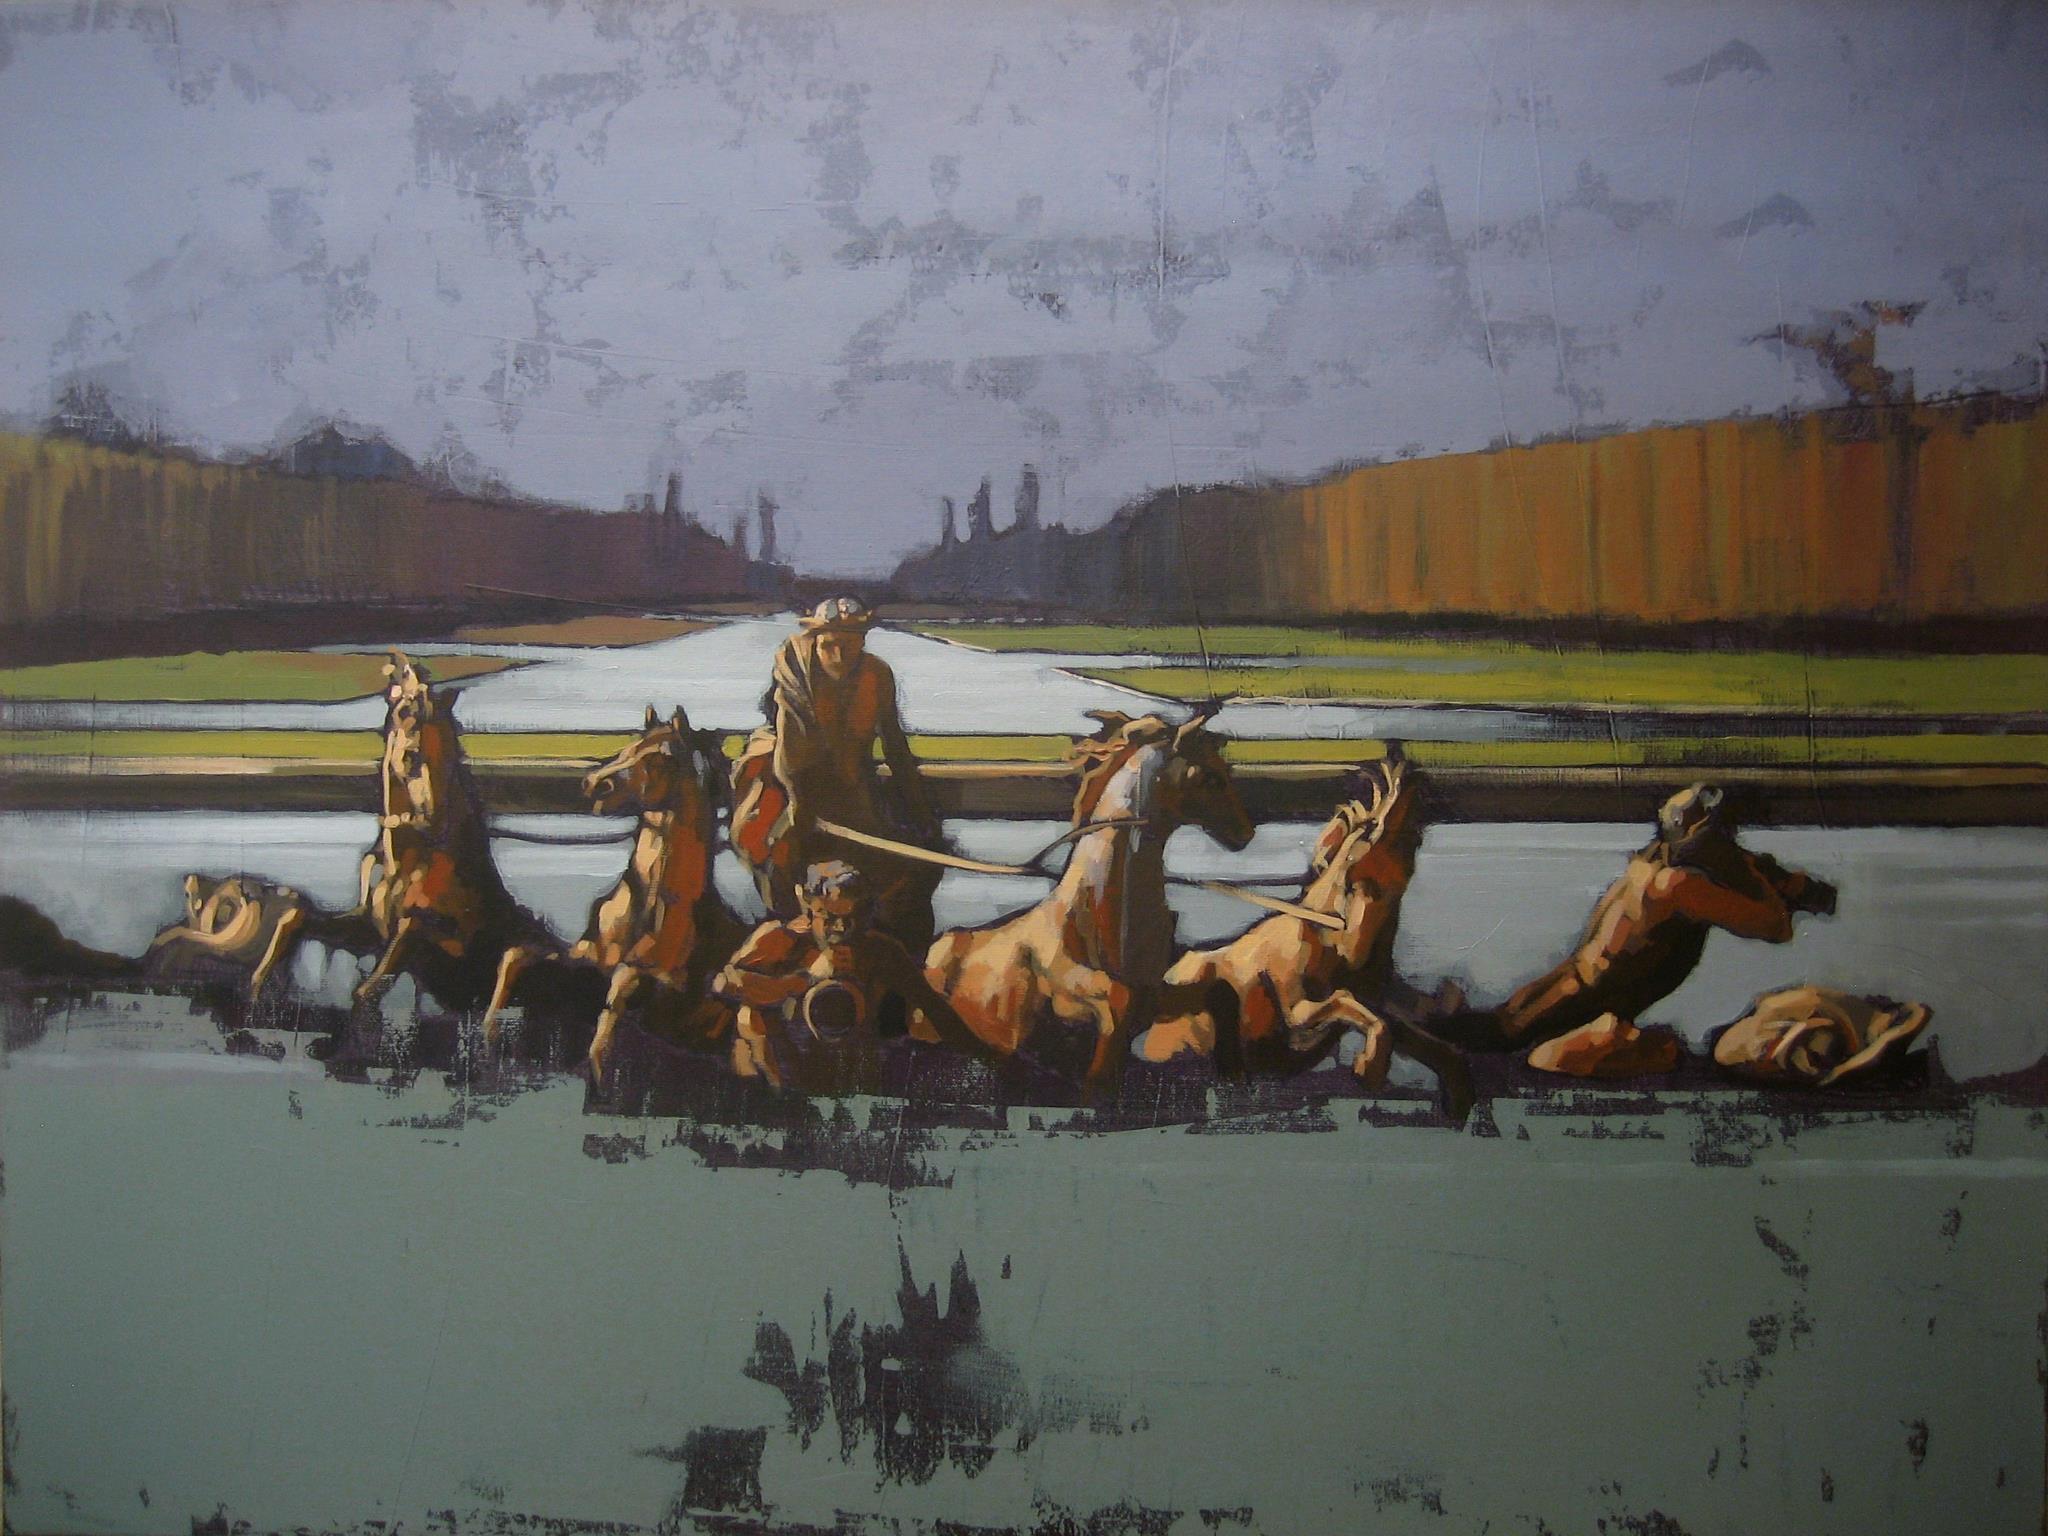 revolution 1 ( wild horses ) - Acrylic 89 x 116 march 2012